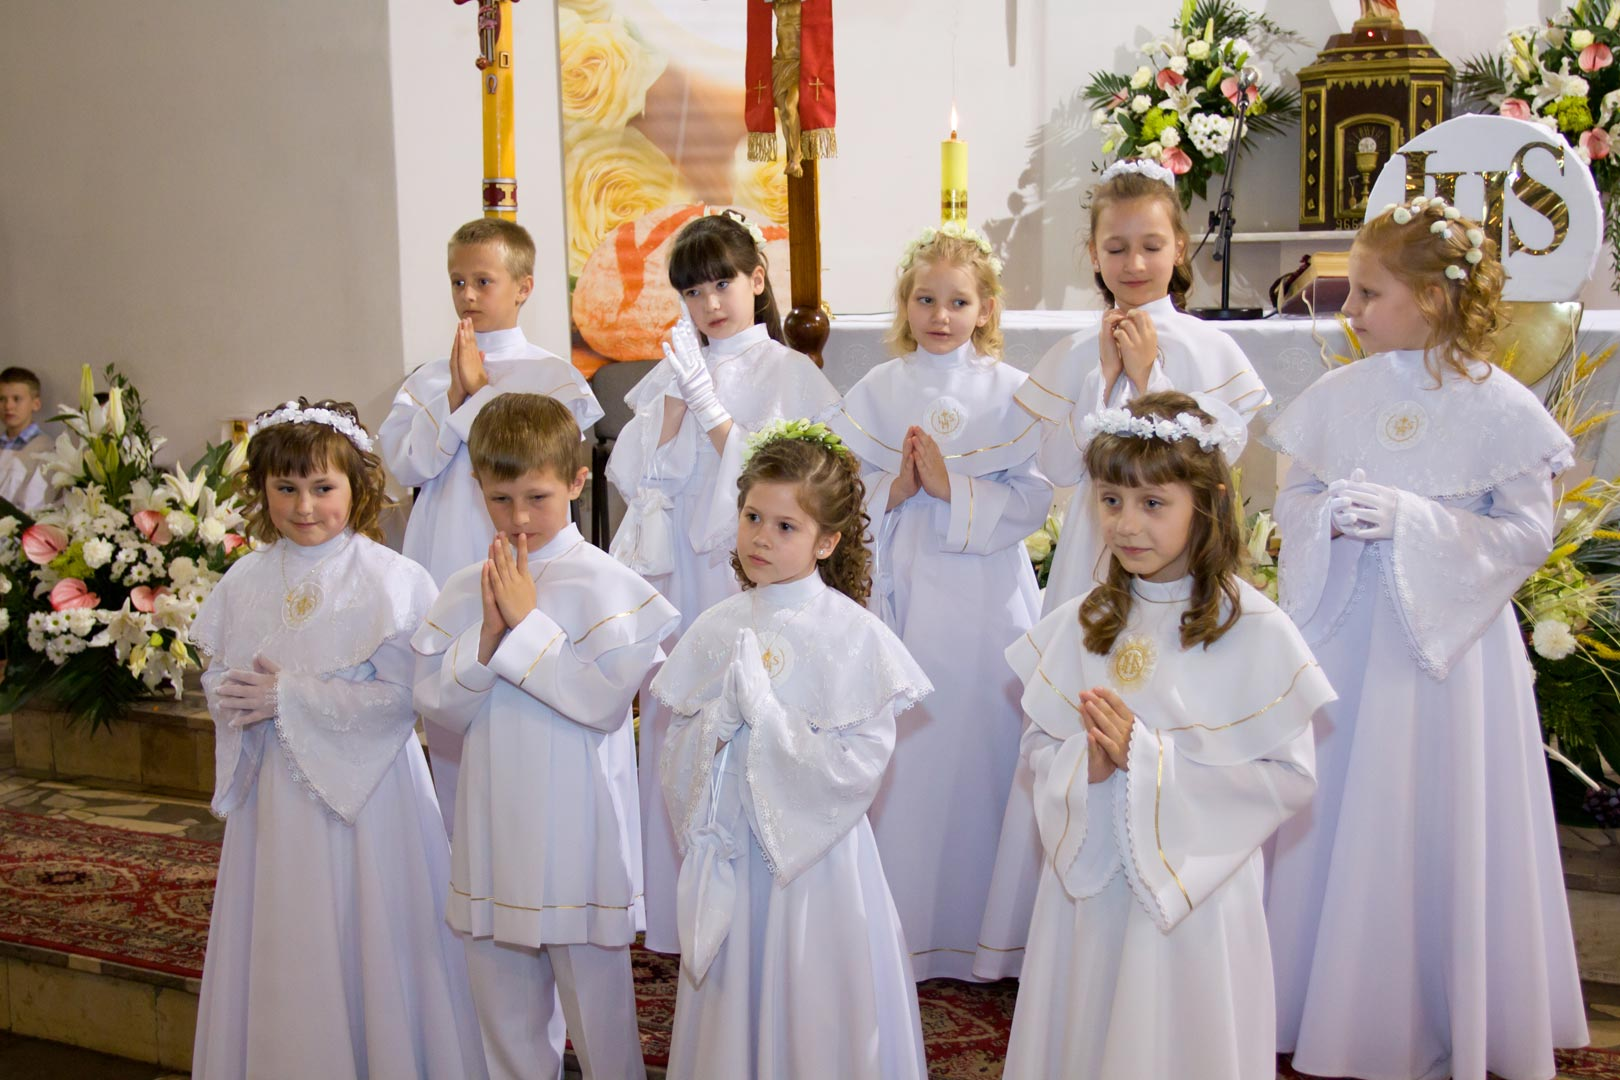 012-communion